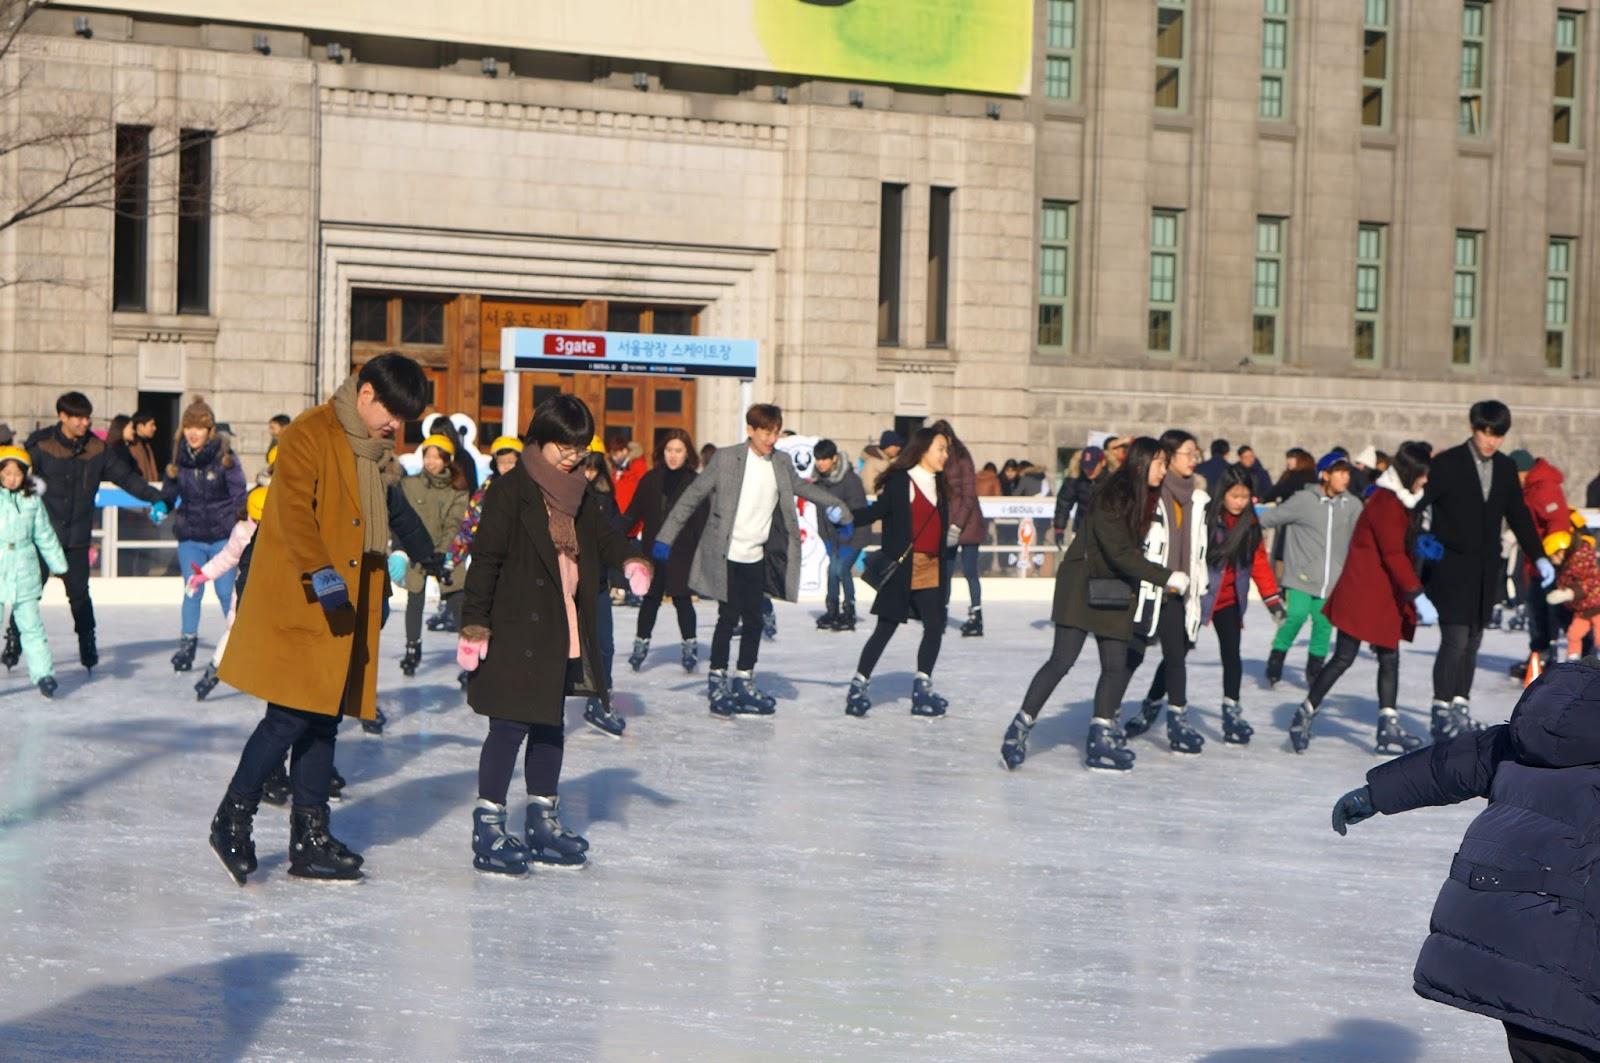 walk with cham outdoor skating at seoul plaza seoul south korea